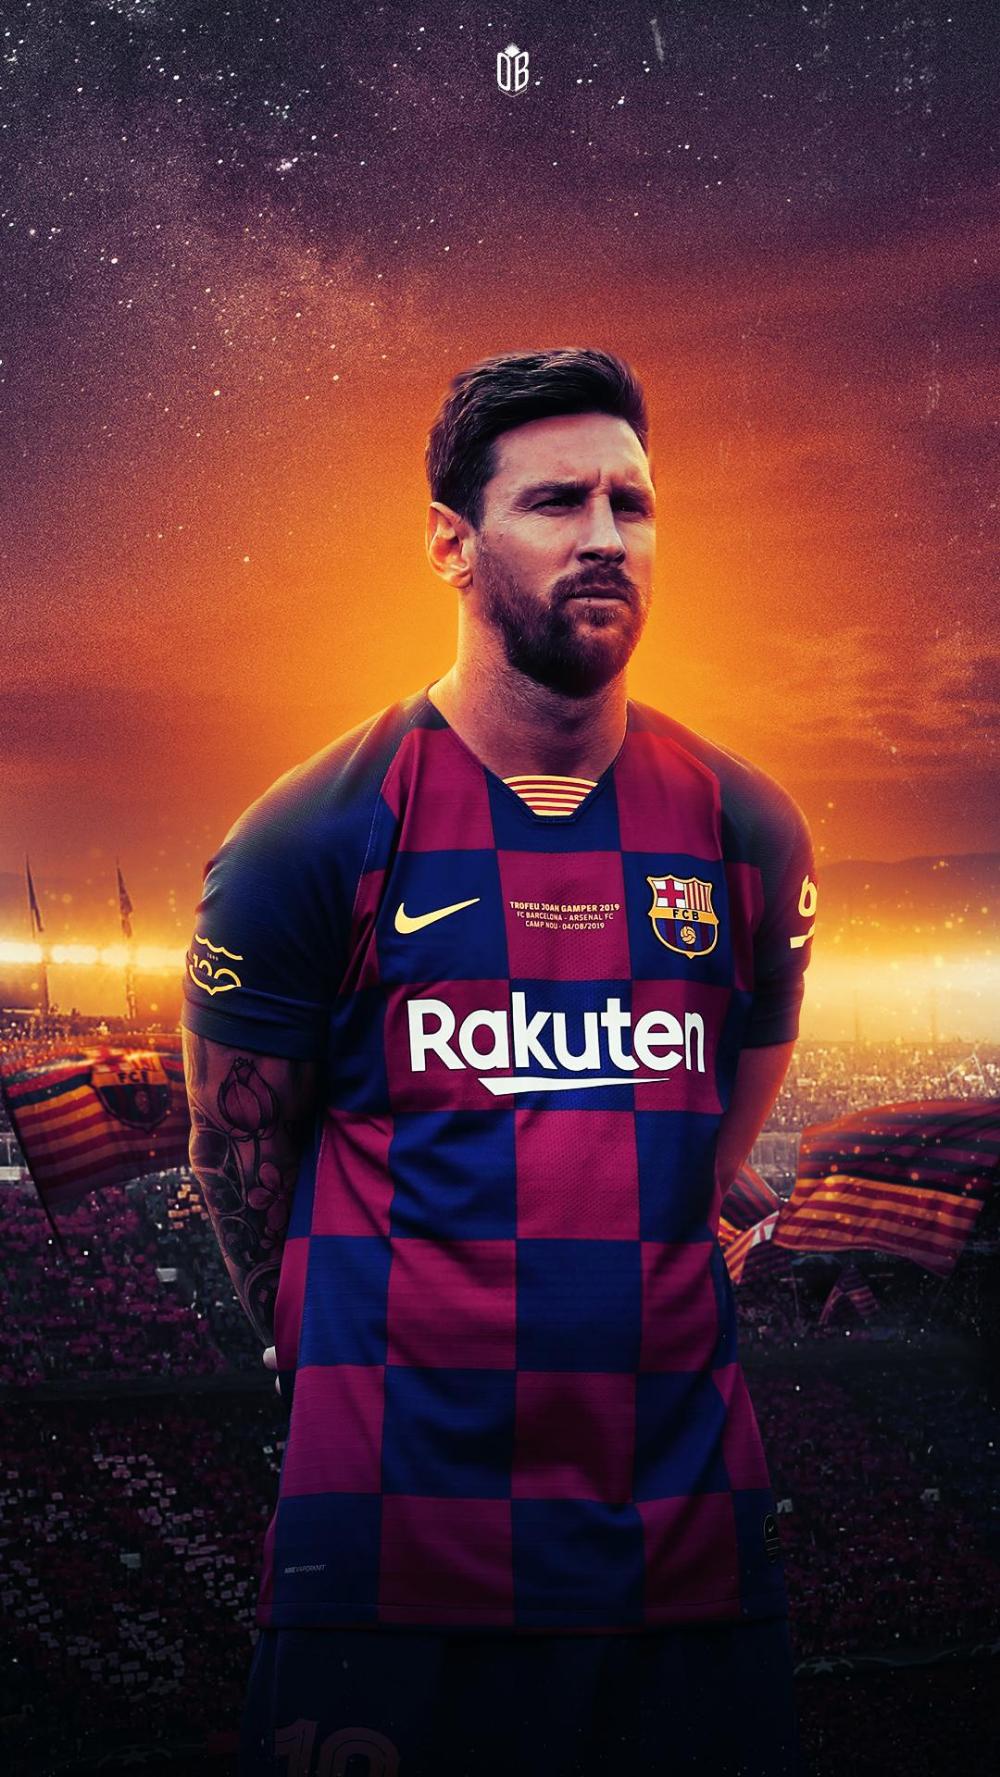 King Of Soccer Lionel Messi Messi Fussball Barcelona Fussball